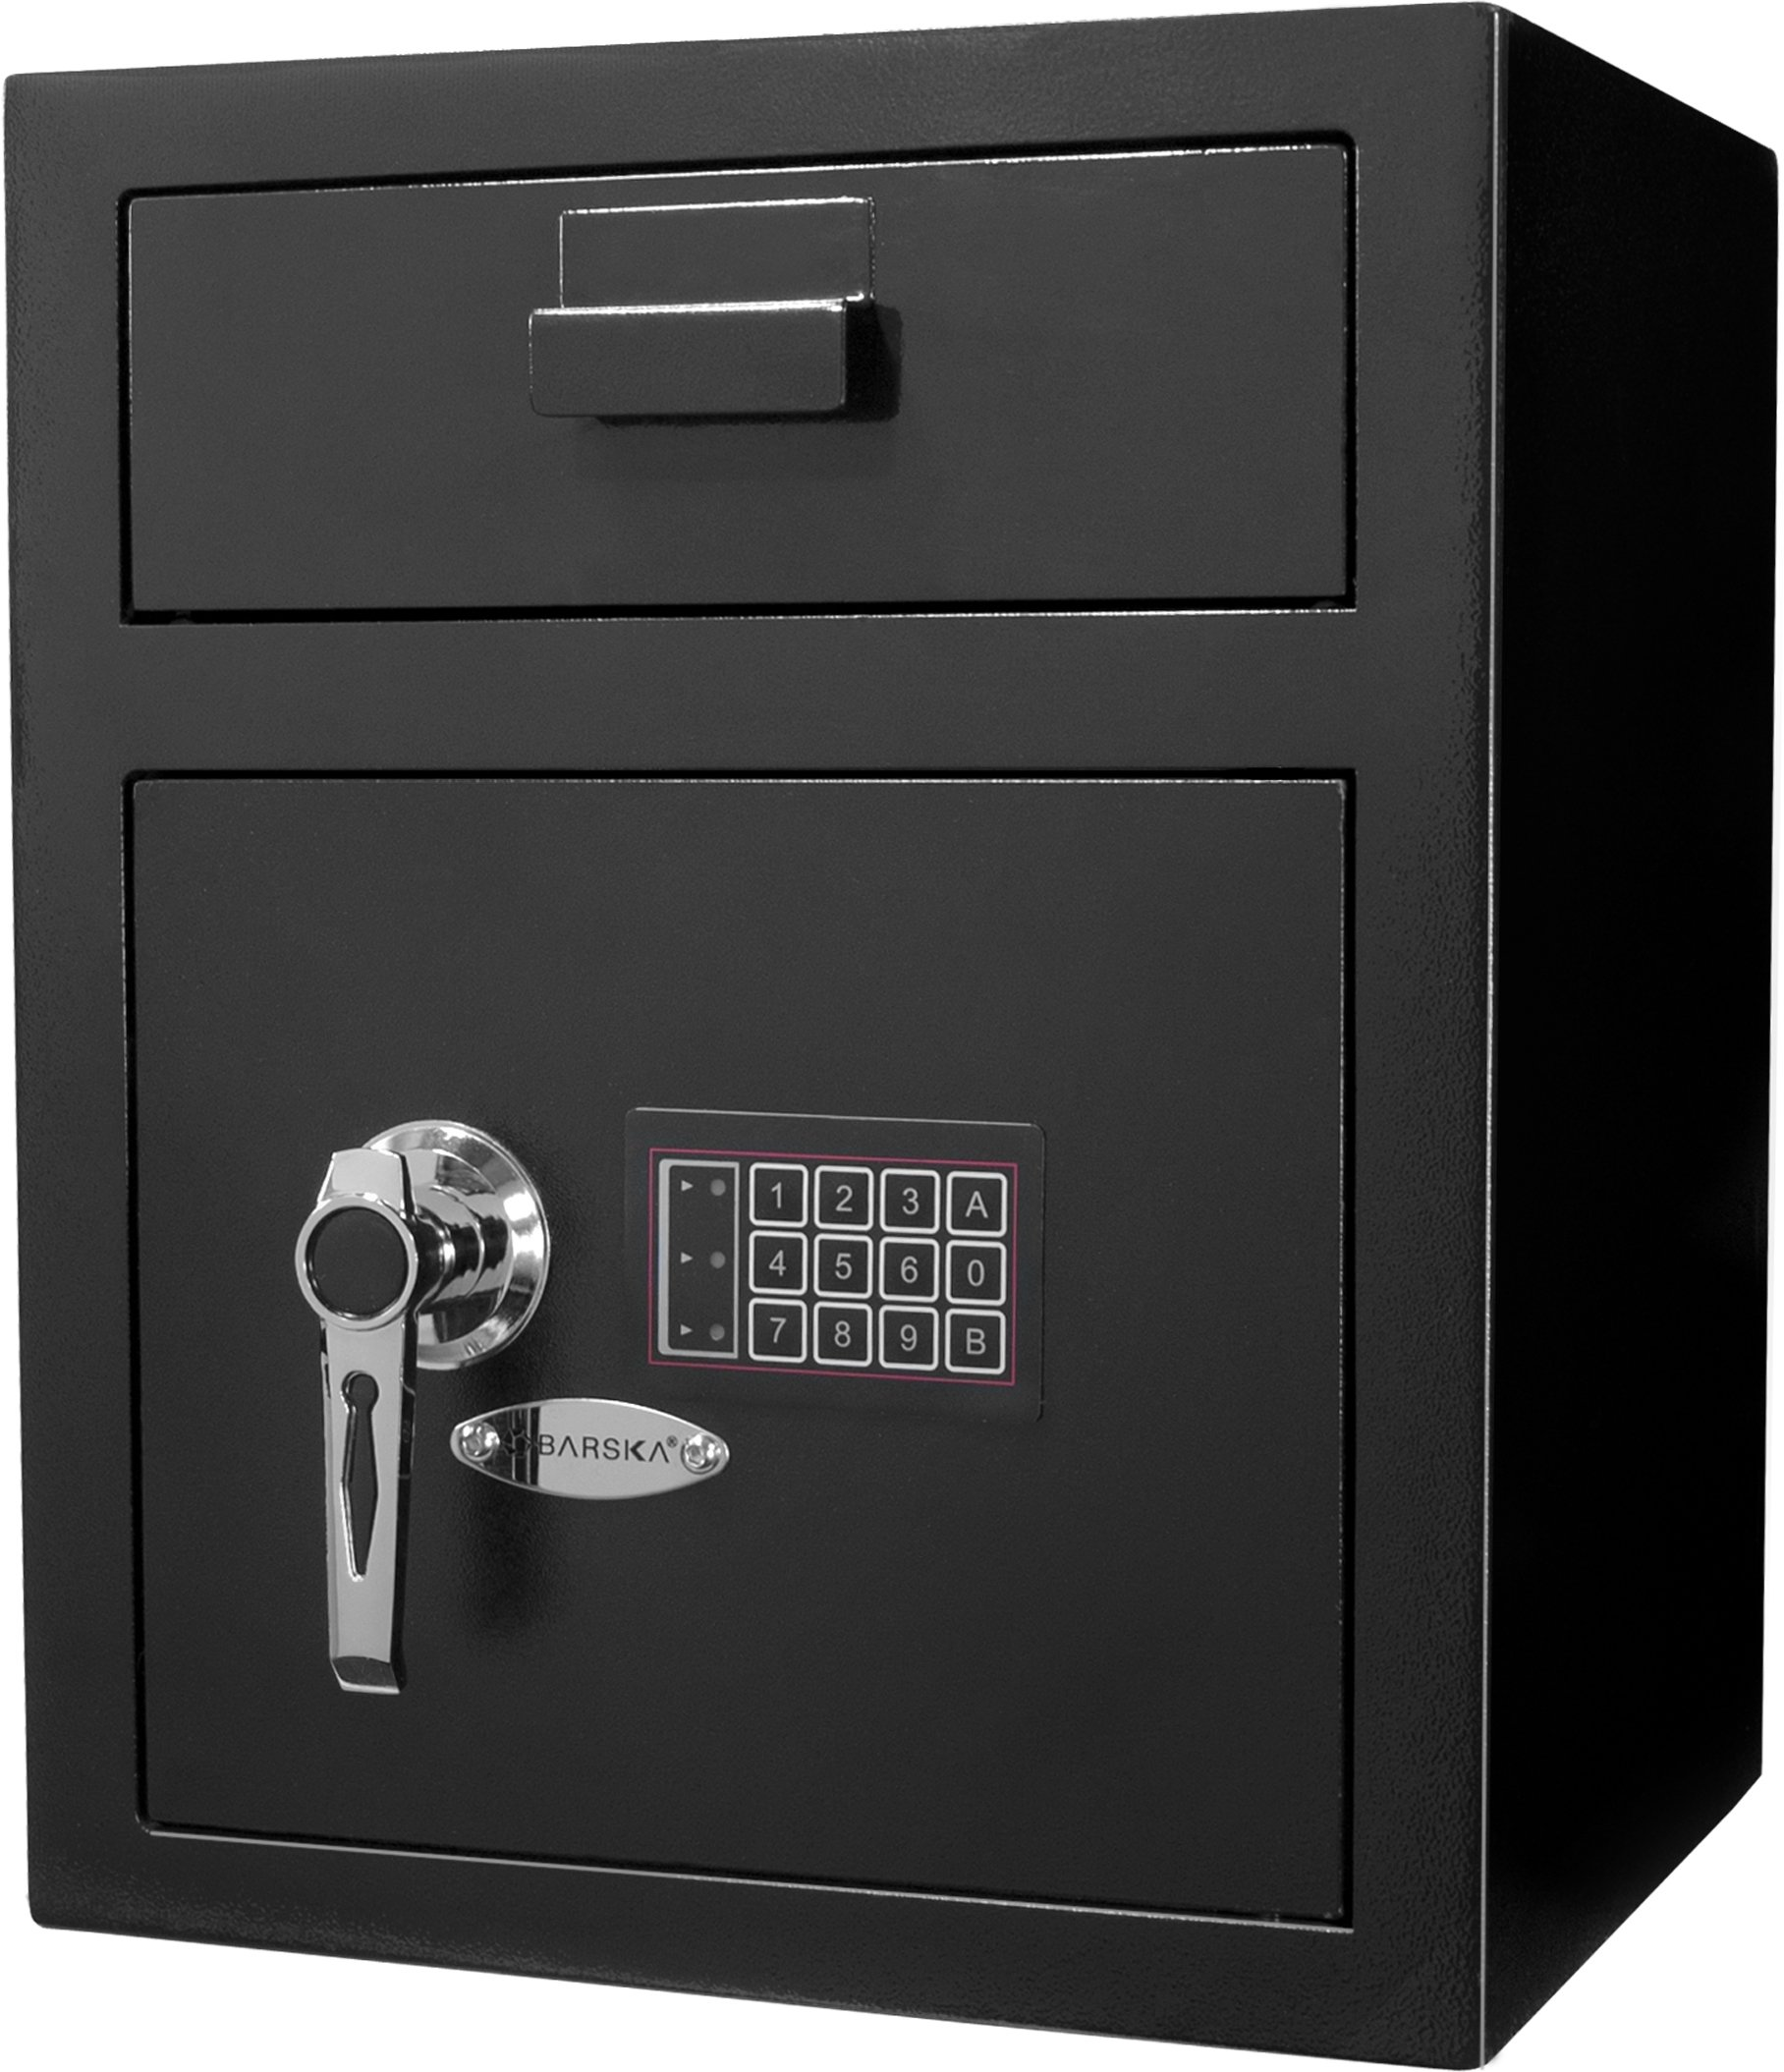 Barska Large Keypad Depository Safe by BARSKA (Image #1)